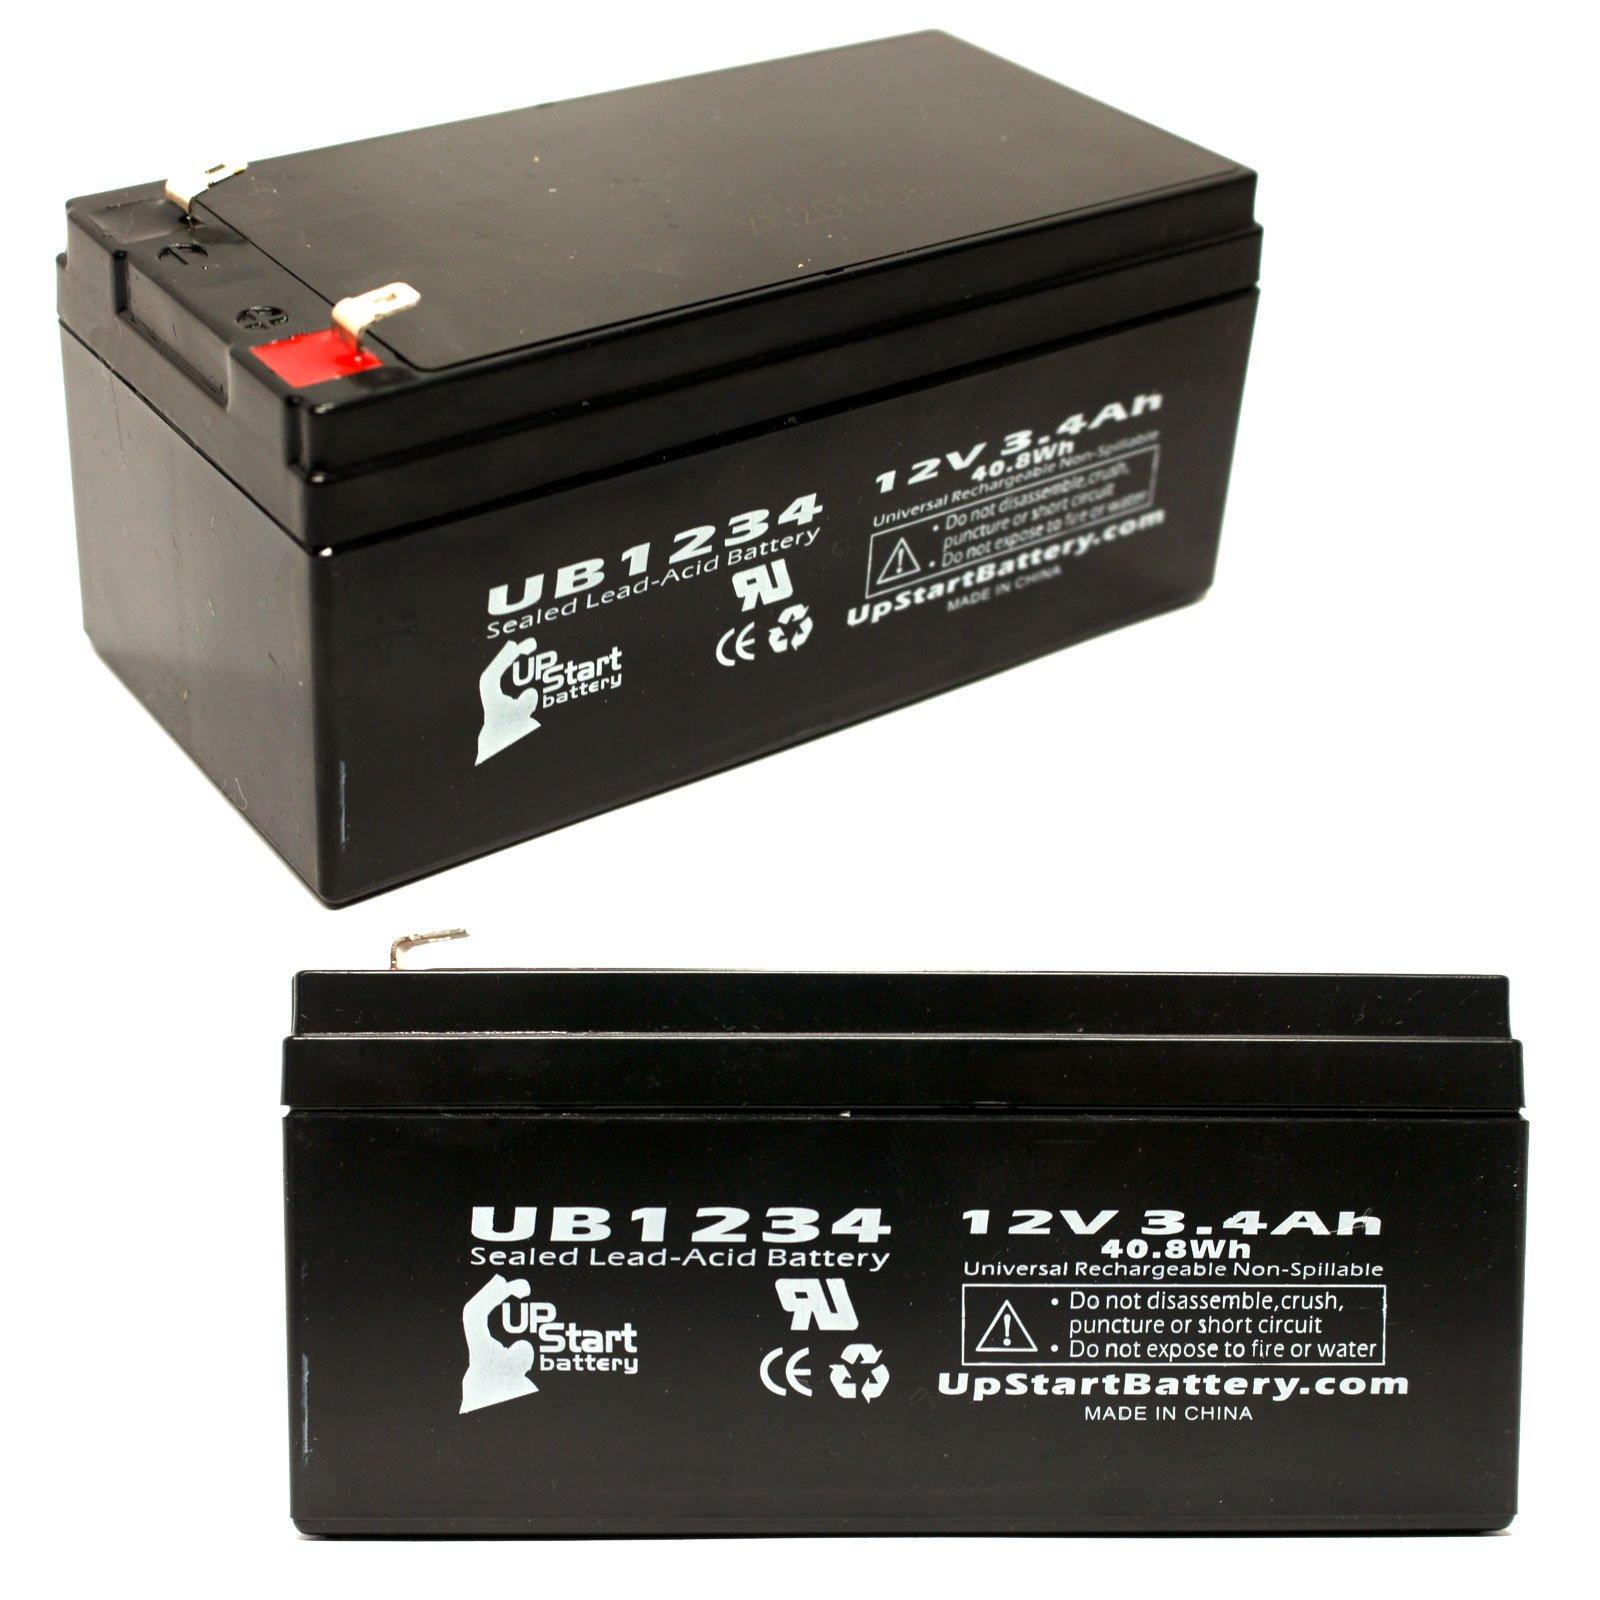 Camera Universal Power UPG-UB1234 Battery 12V 3.4AH